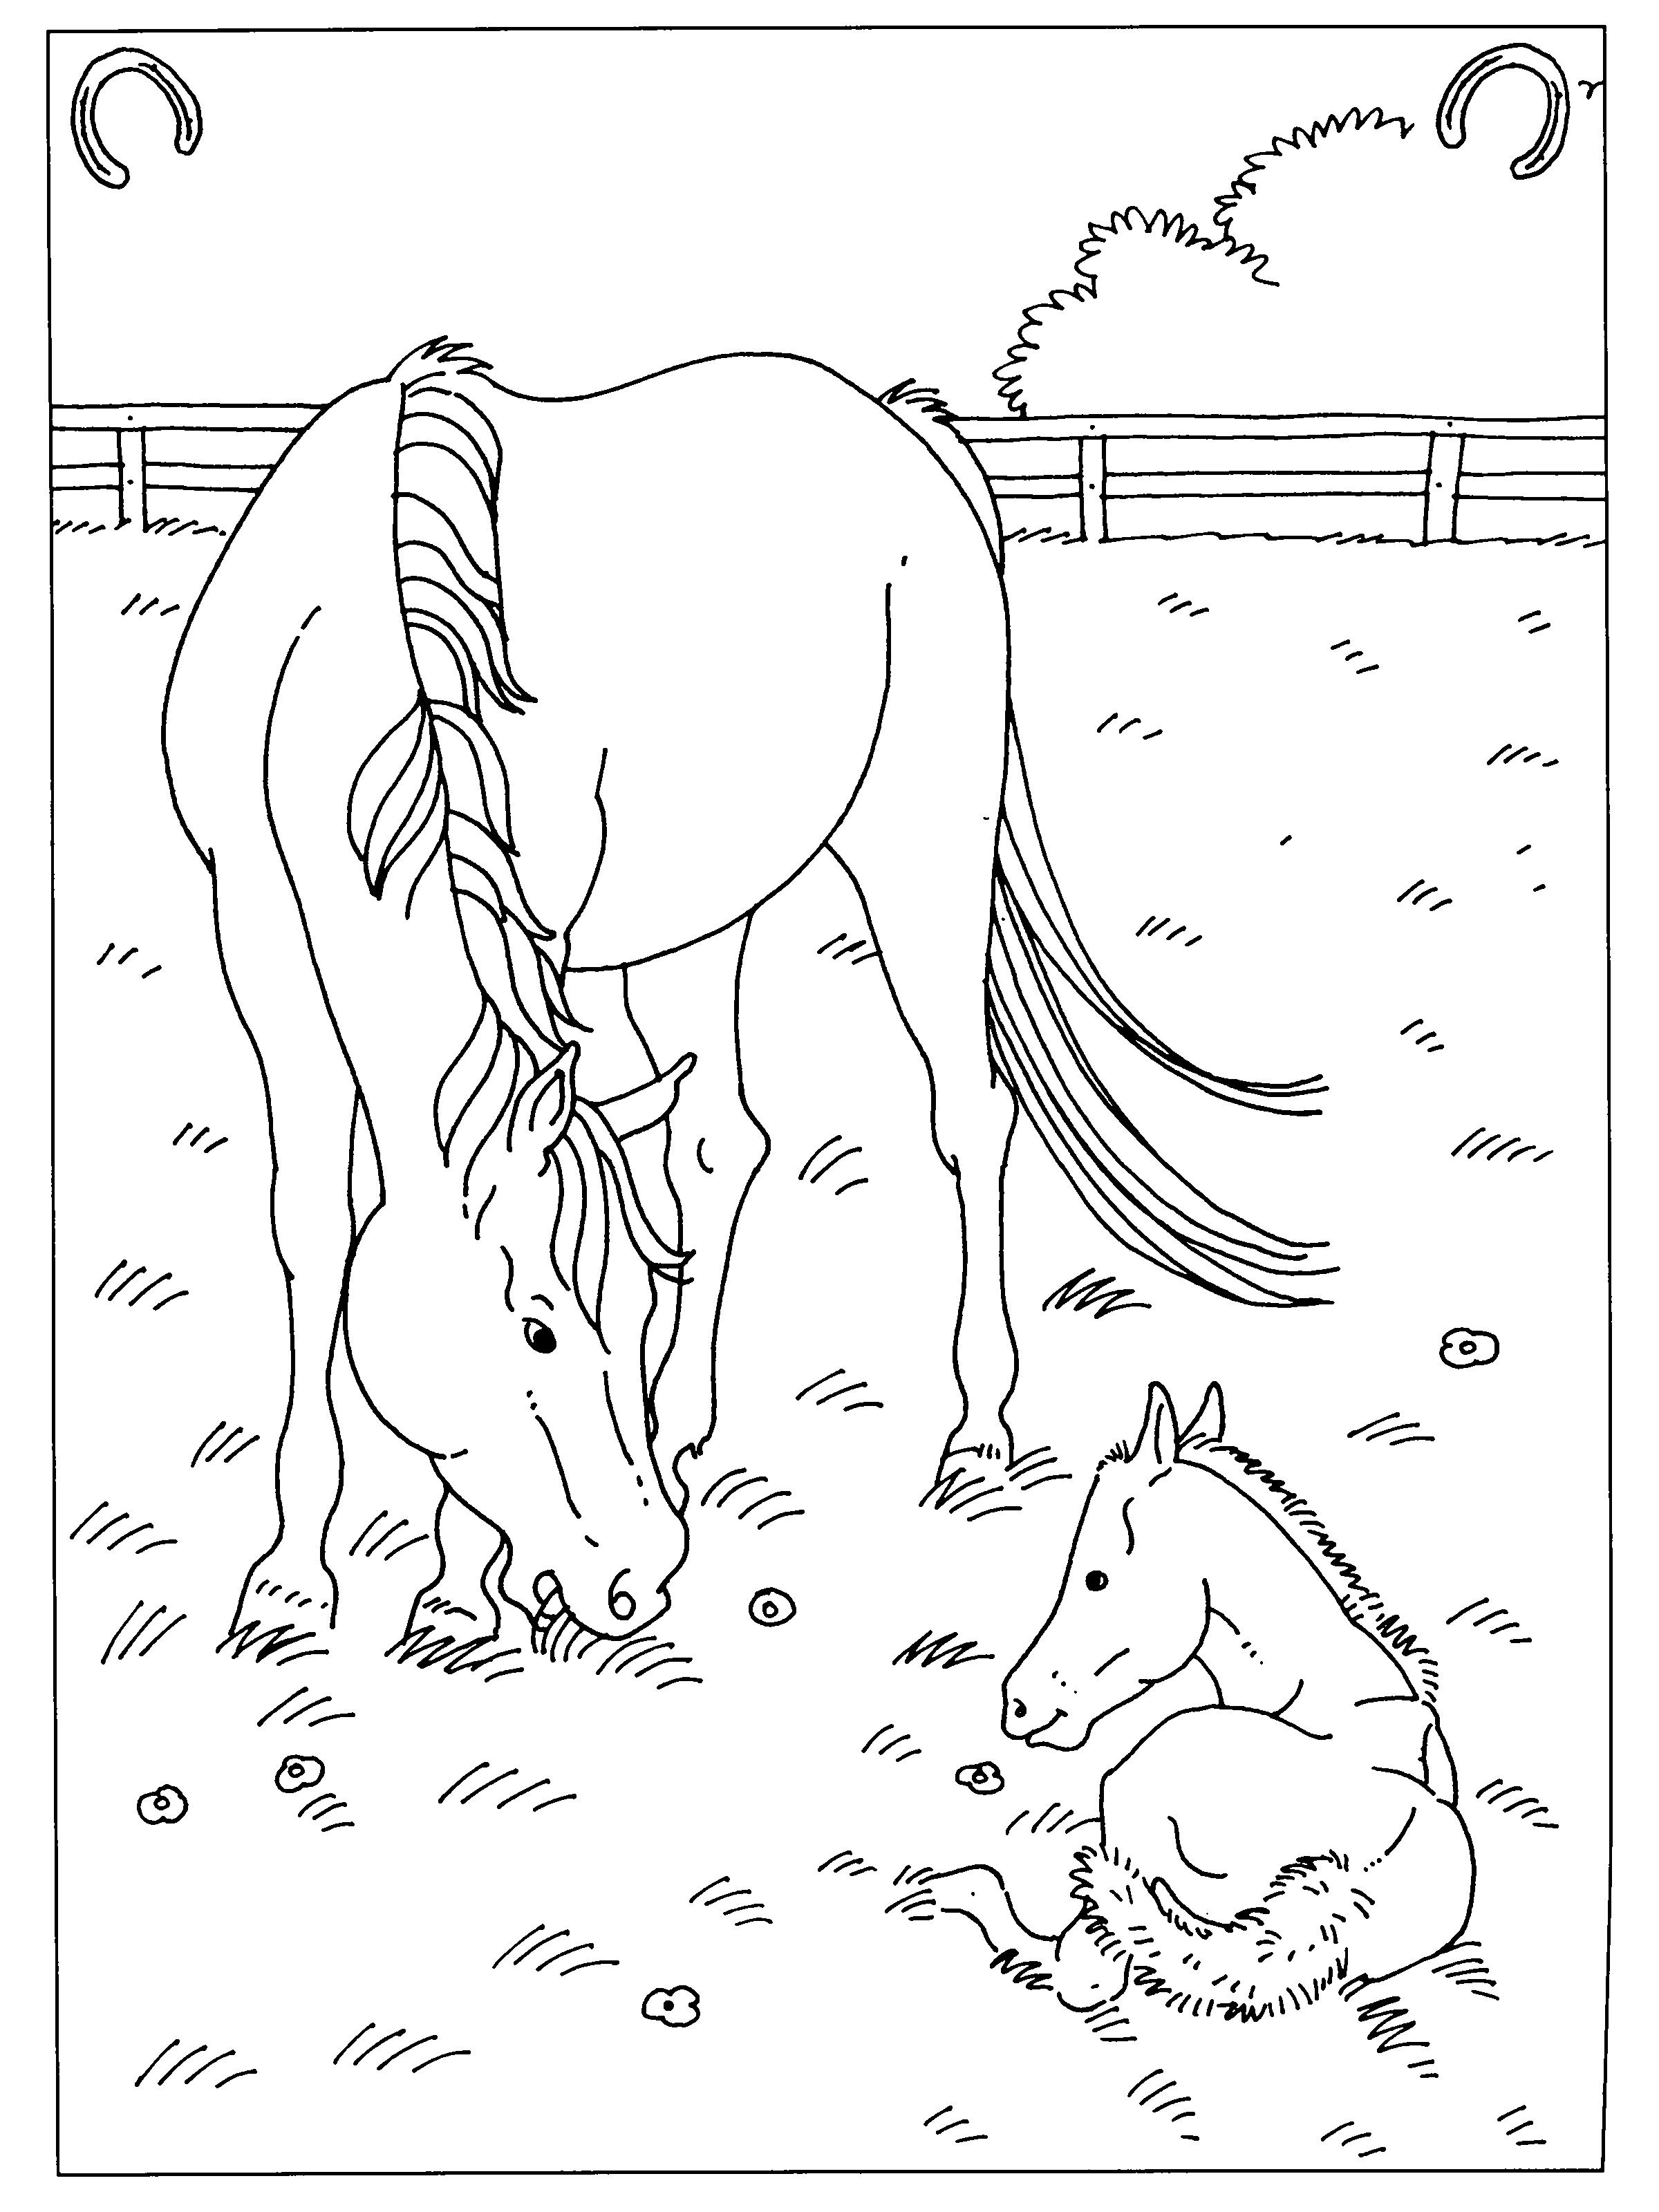 Ausmalbilder Mandala Pferd : Paard 01 04 Png 2400 3200 Pferde Party Pinterest